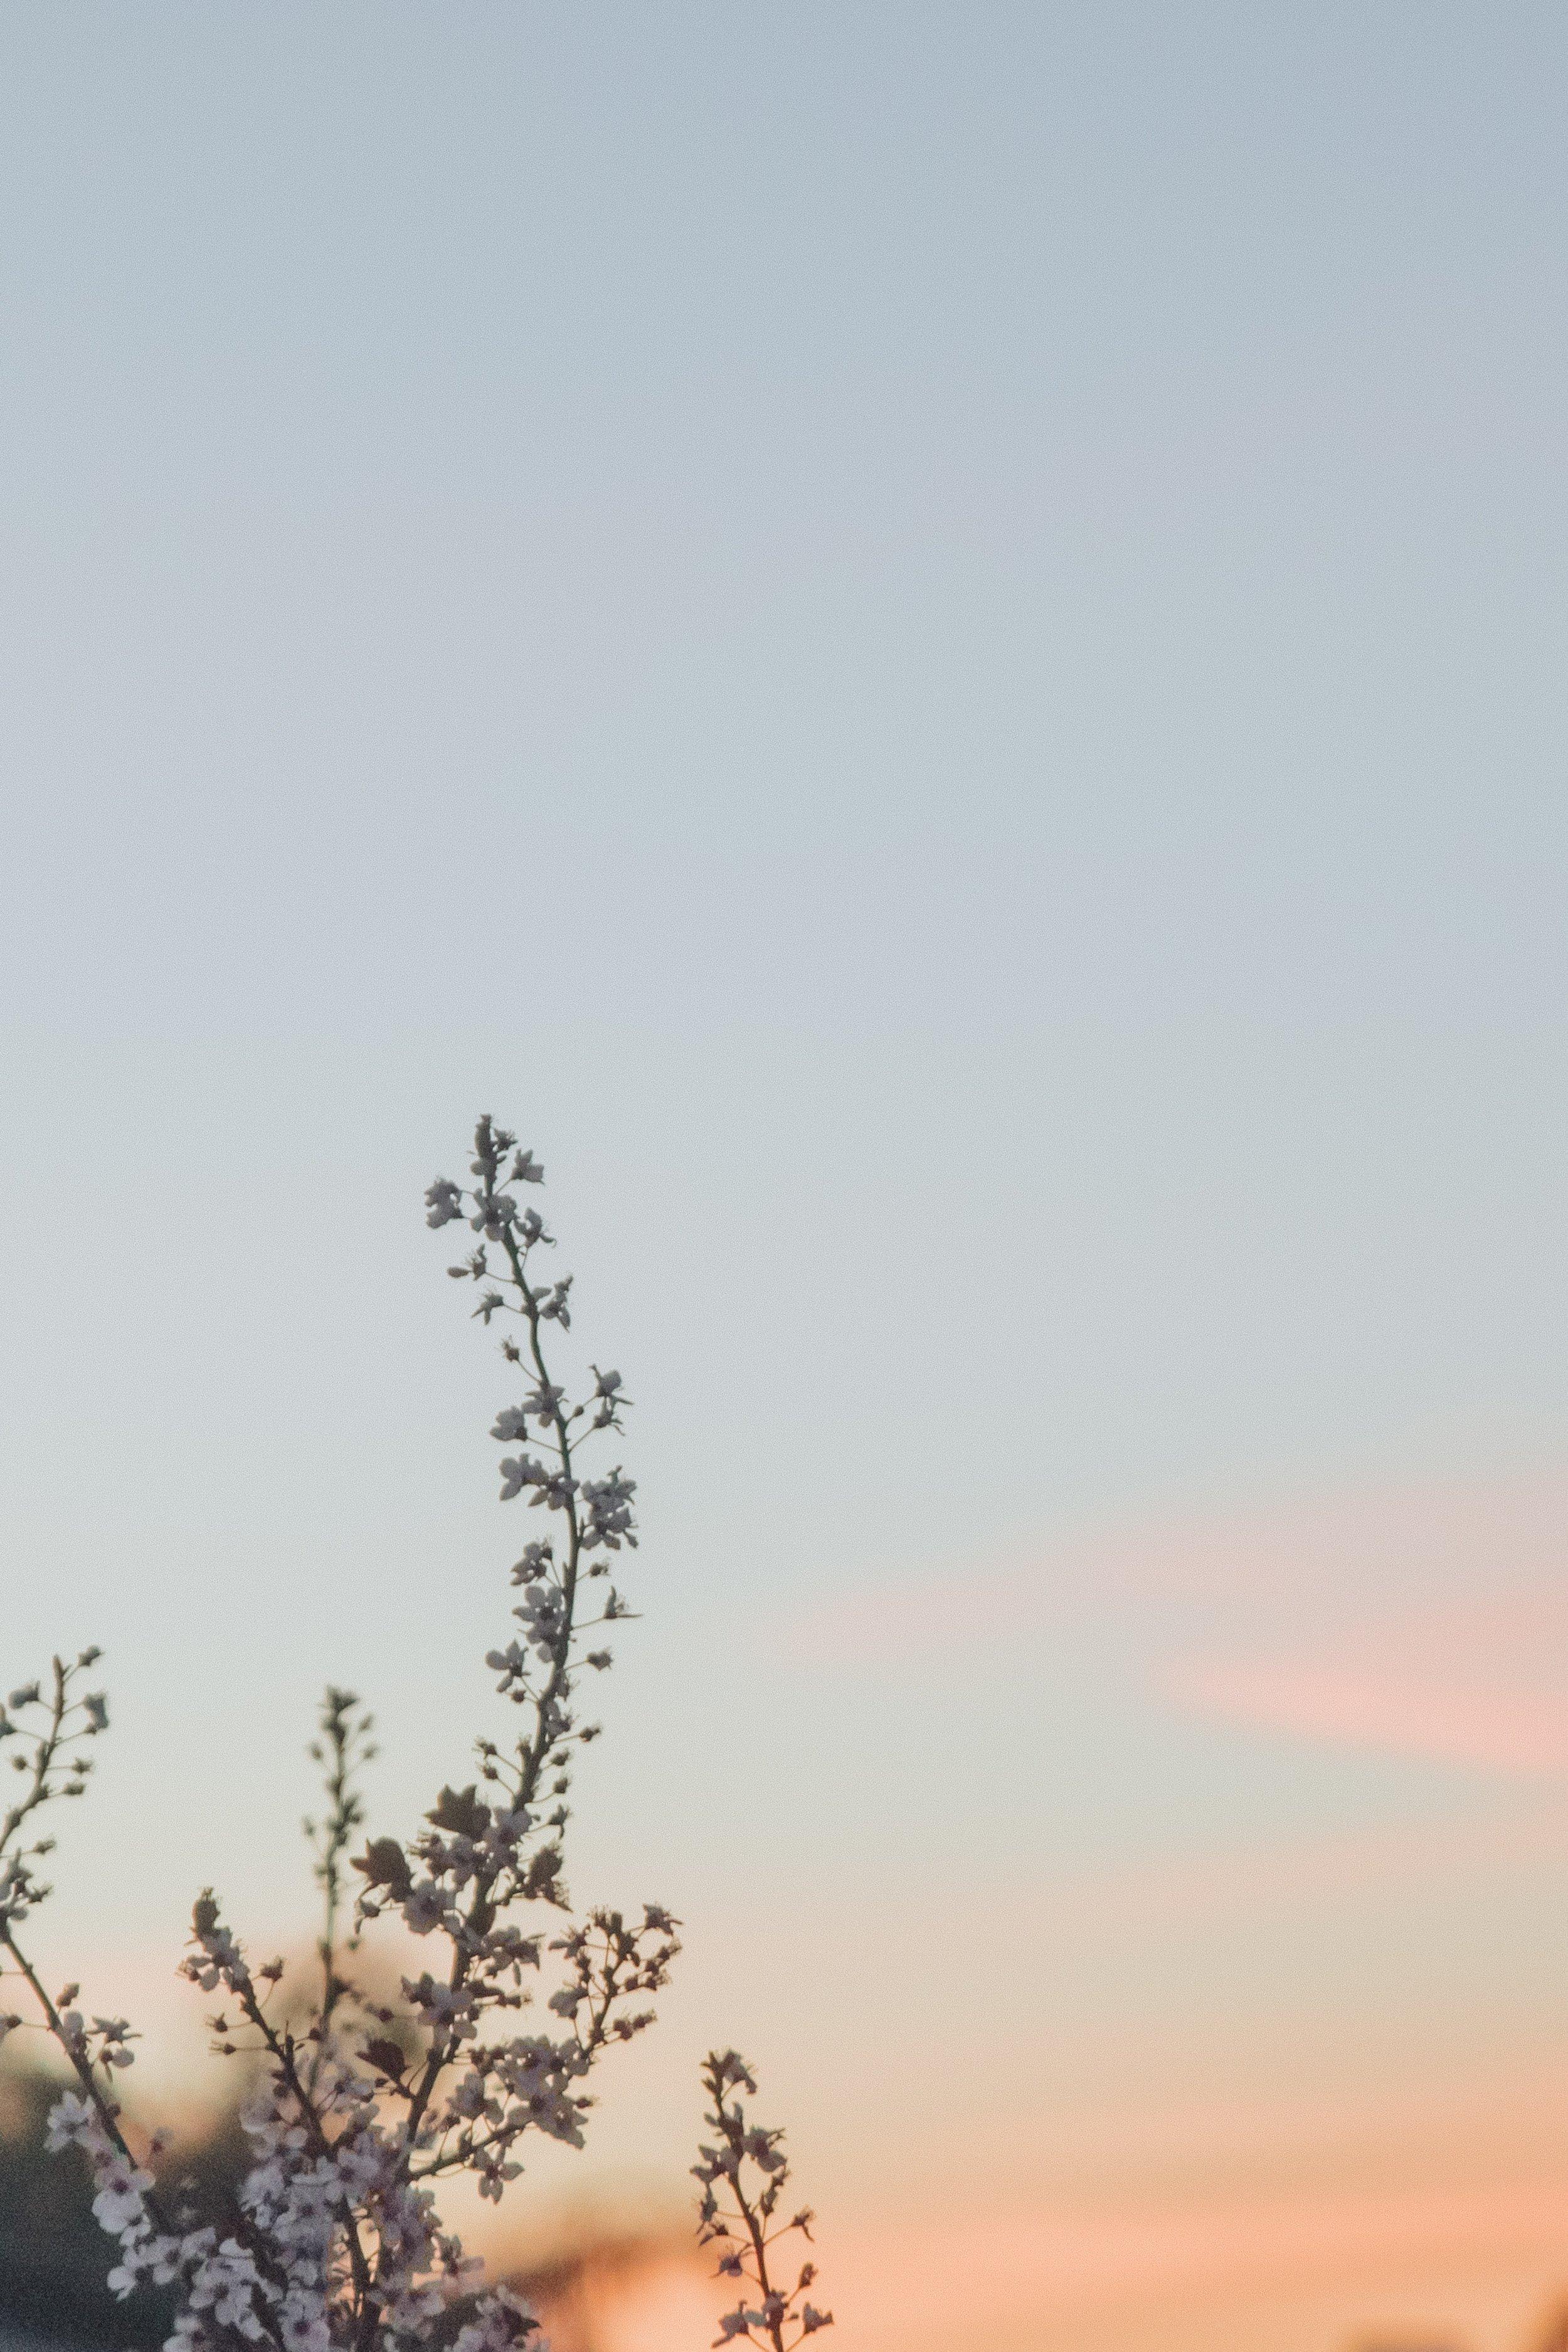 caleb-woods-323928-unsplash.jpg